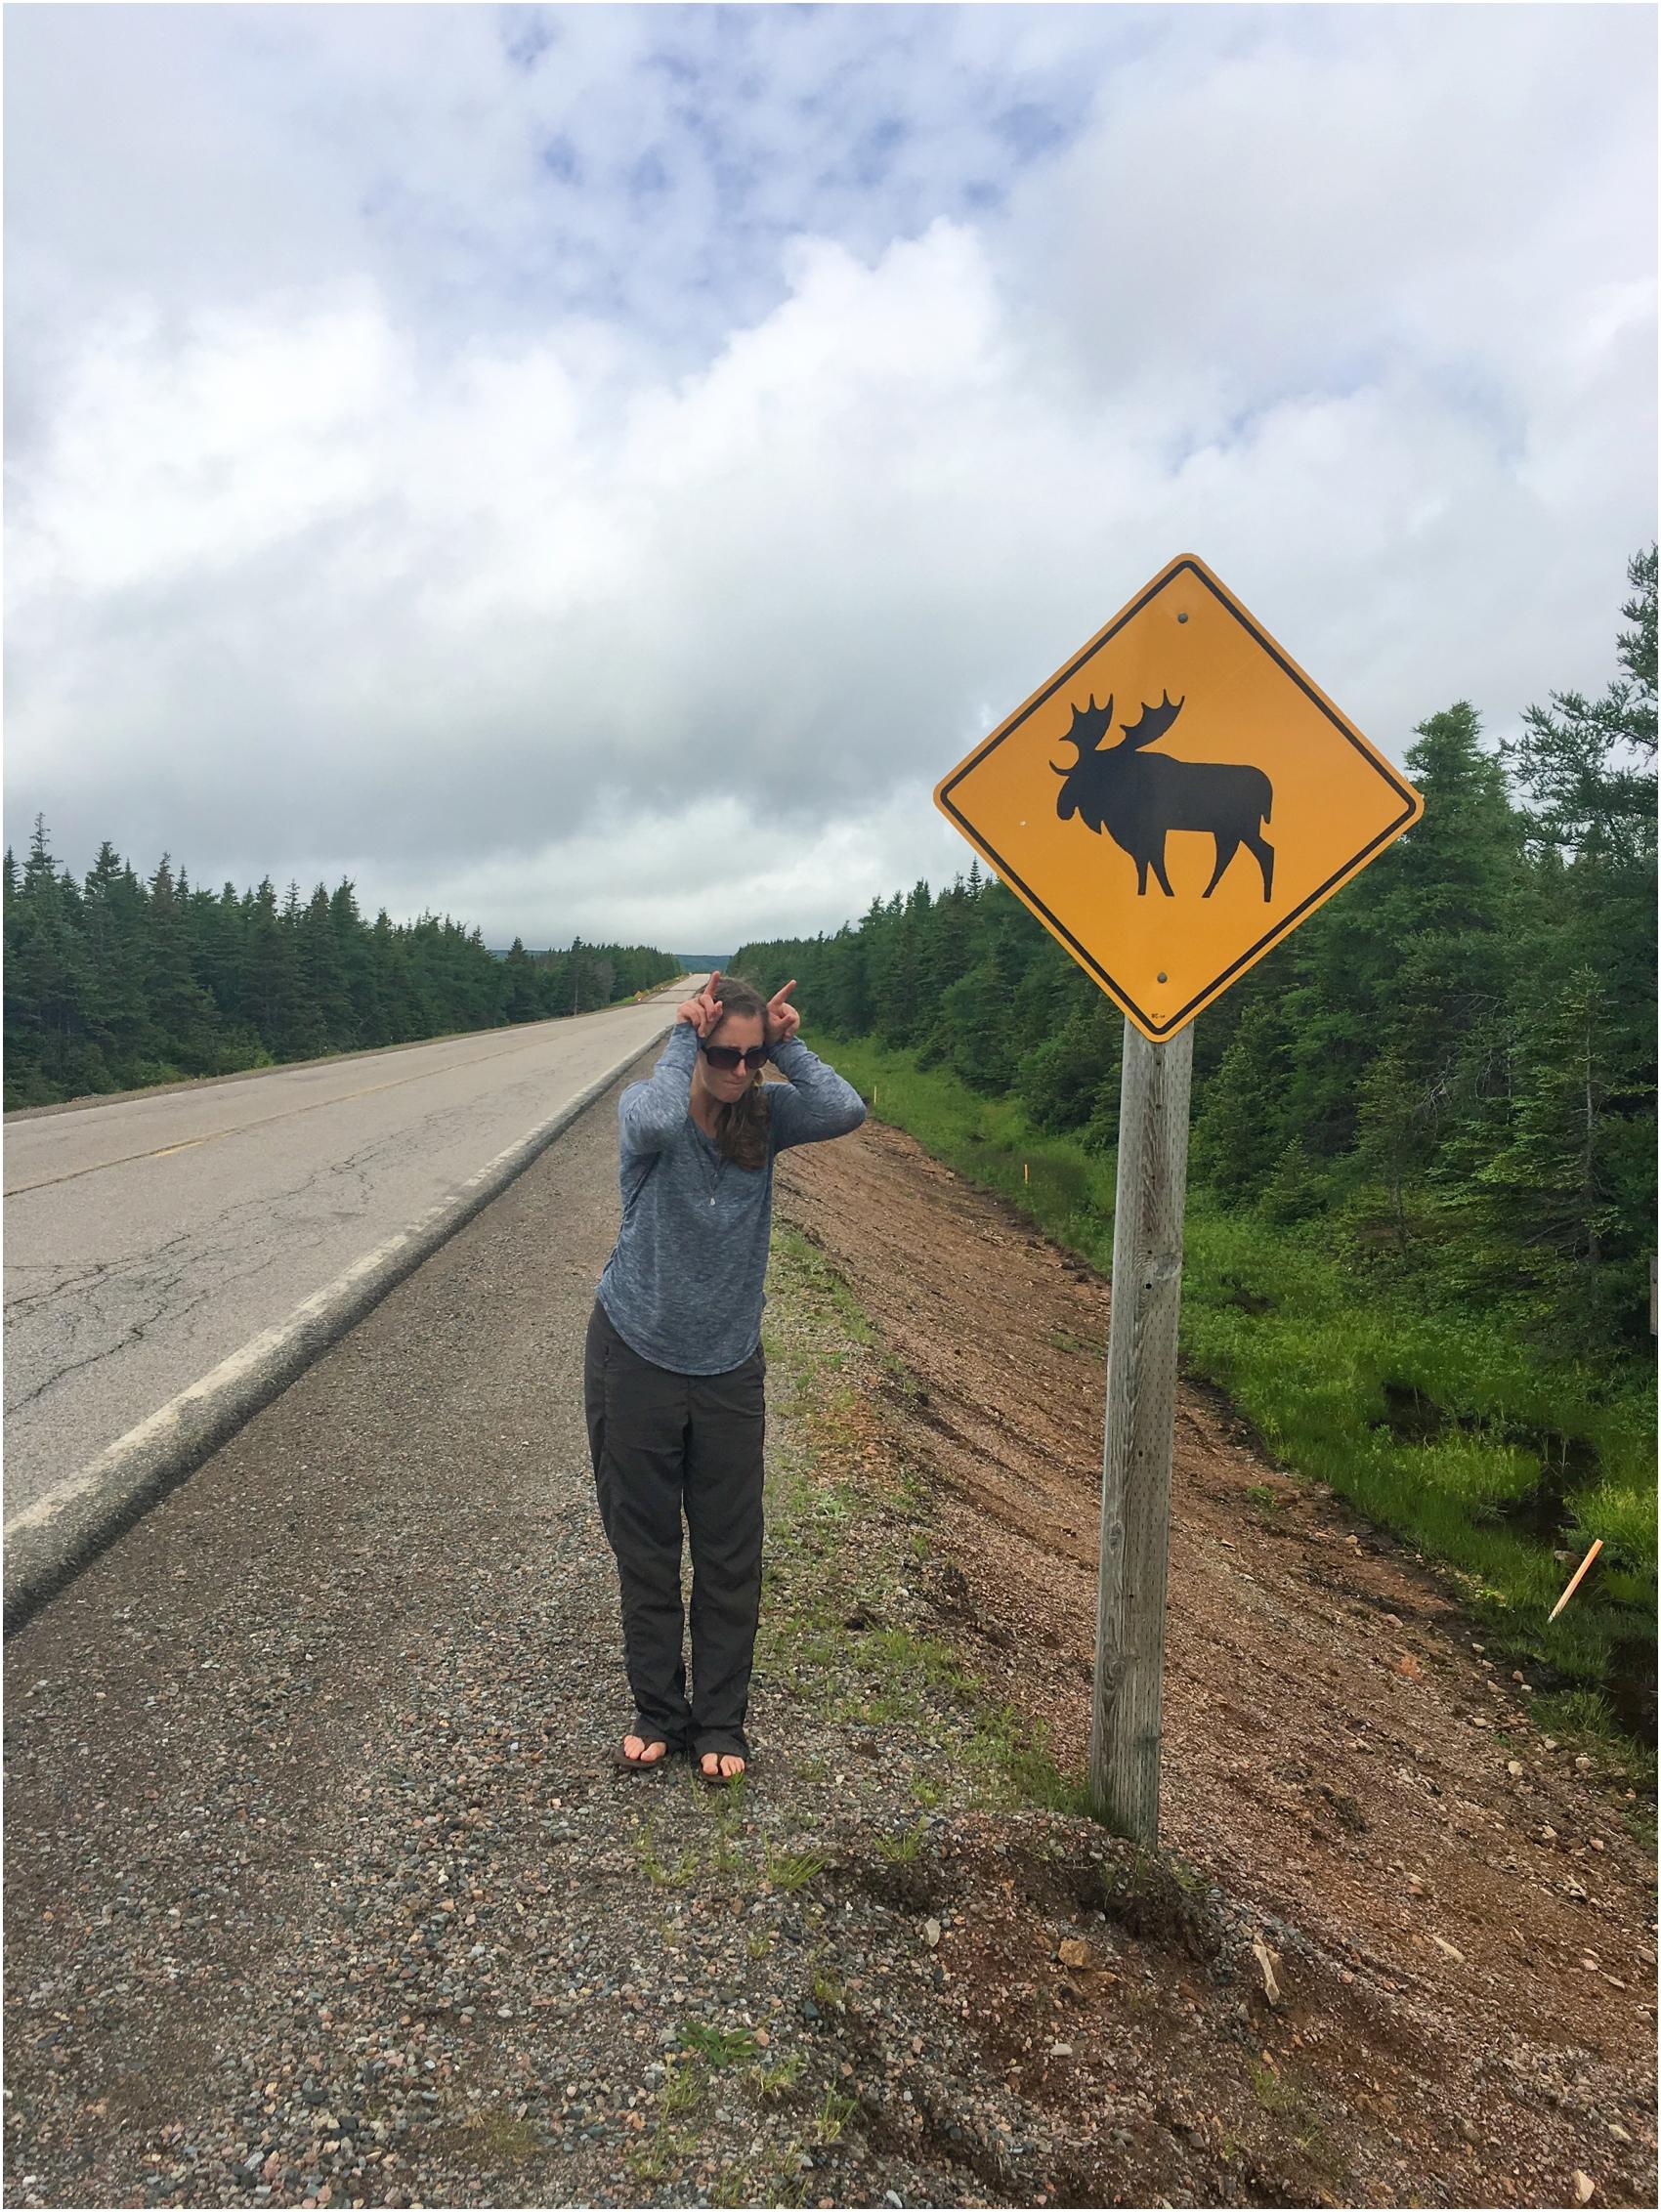 CanadianRoadTrip2016-62.jpg